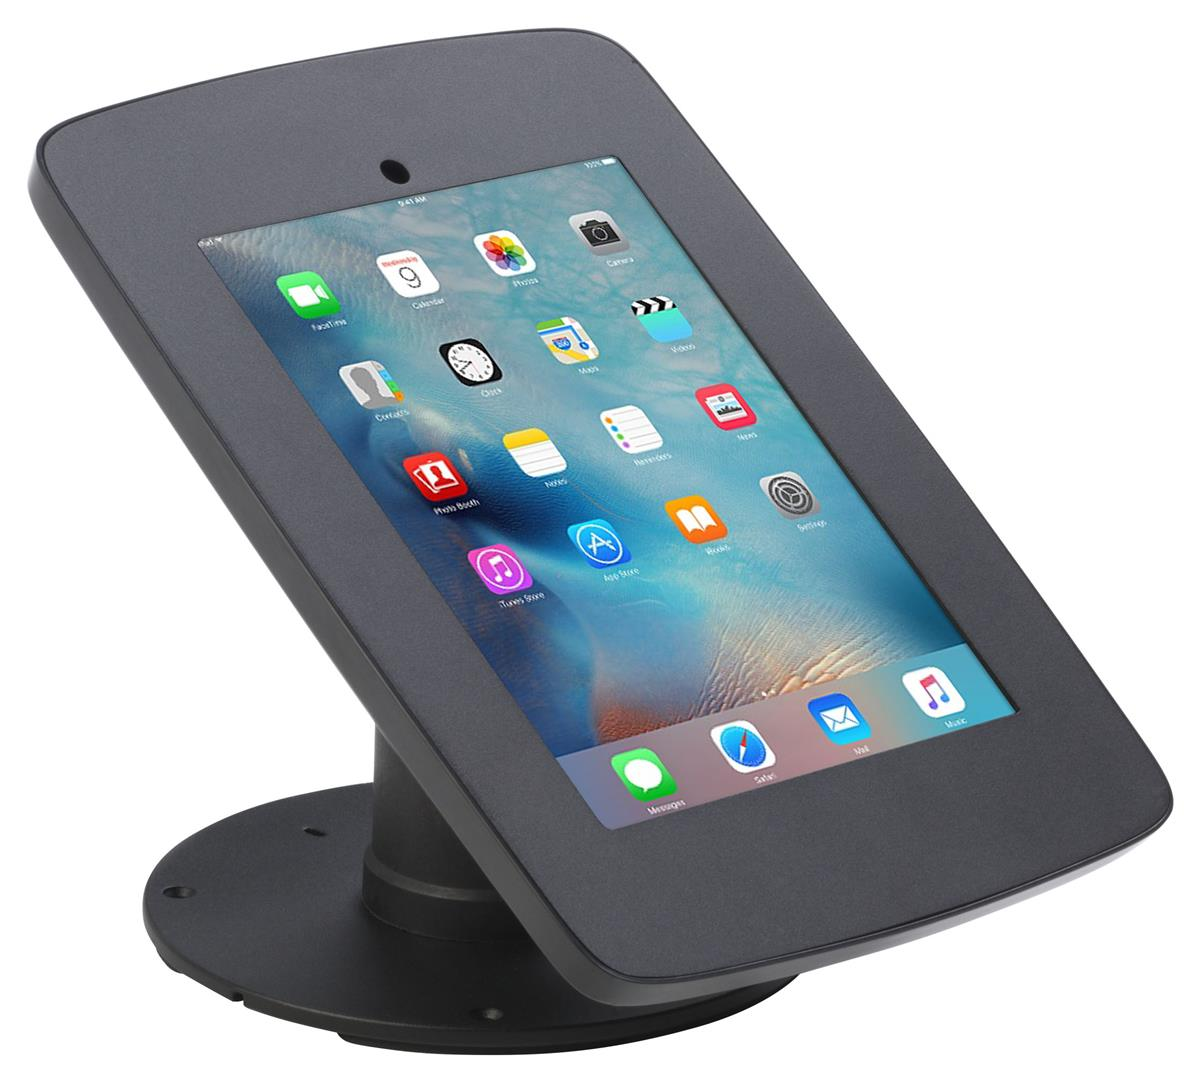 iPad Counter Stand w/ Flip Screen Share, Locked Enclosure, Hidden Home  Button - Black